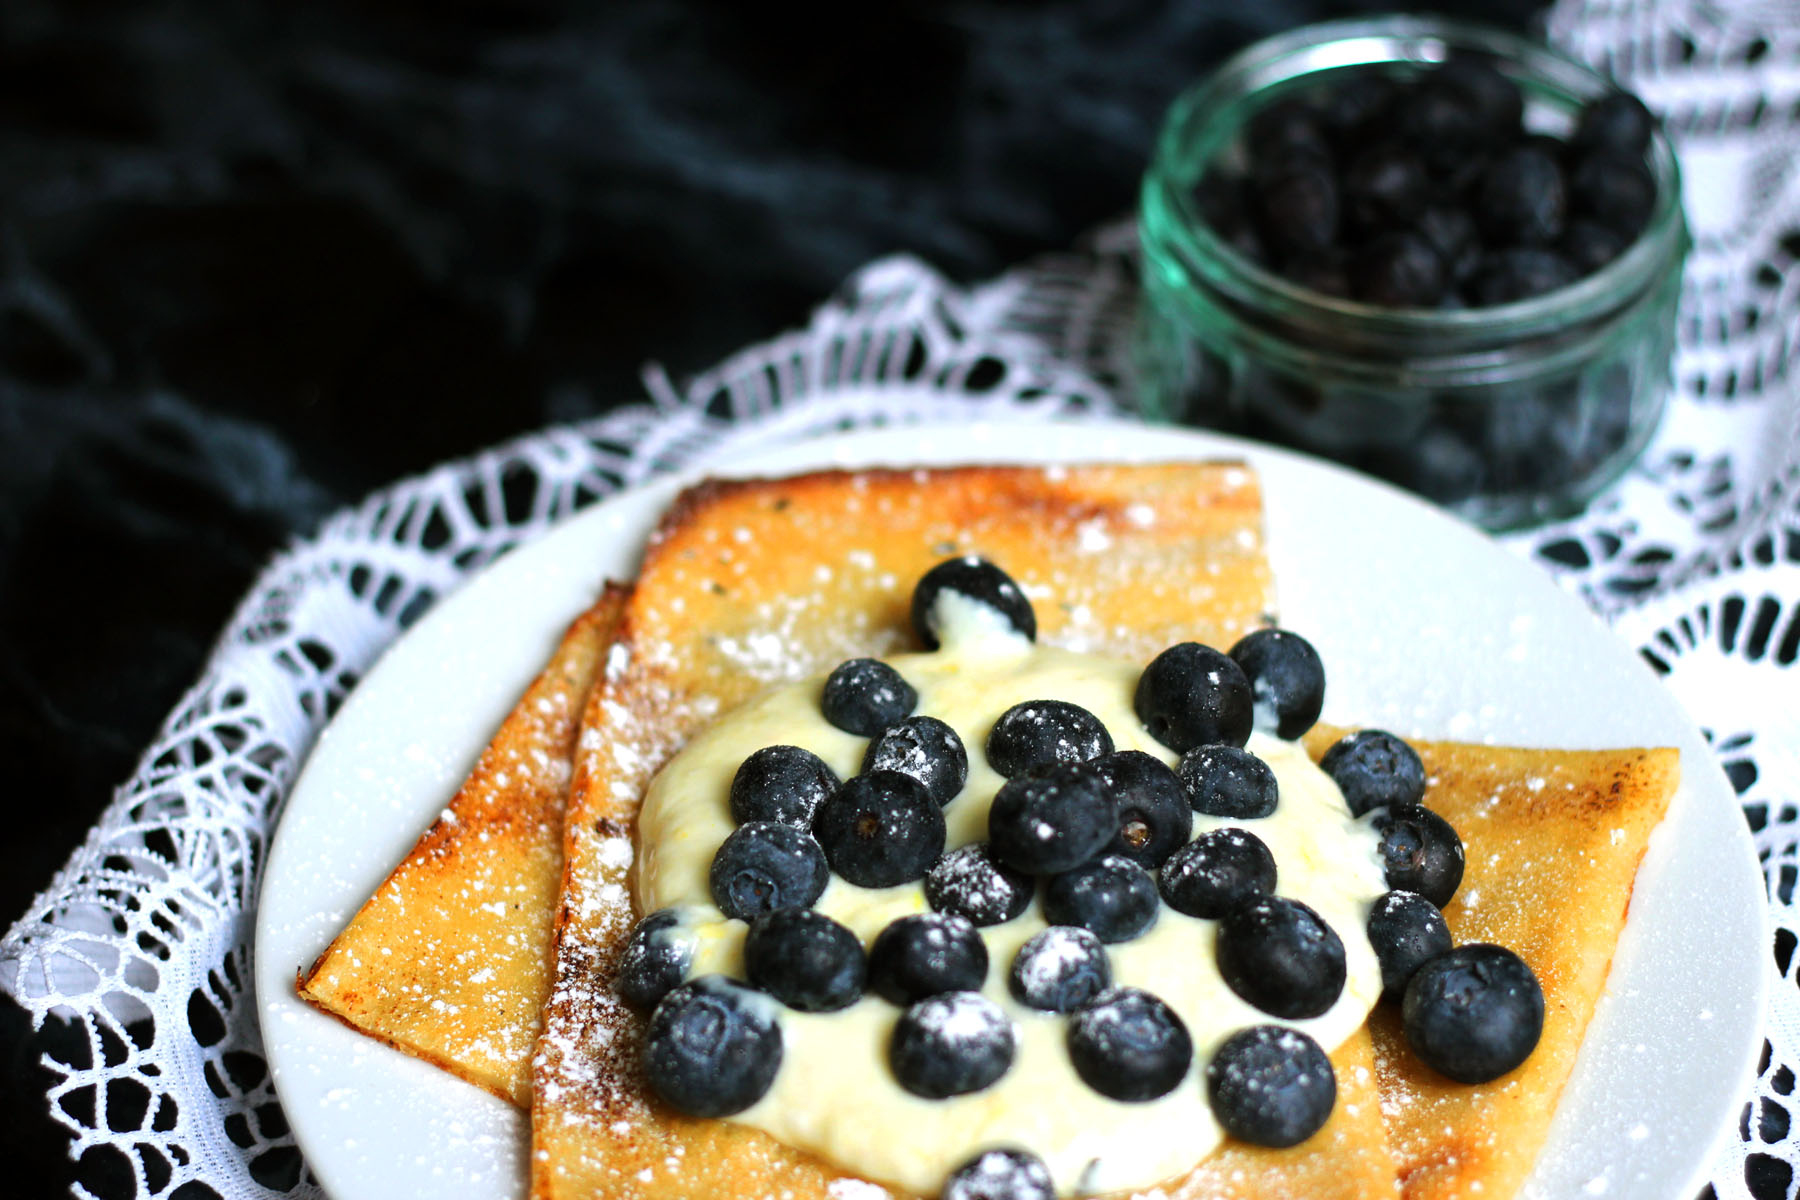 Scandinavian Oven Baked Pancakes